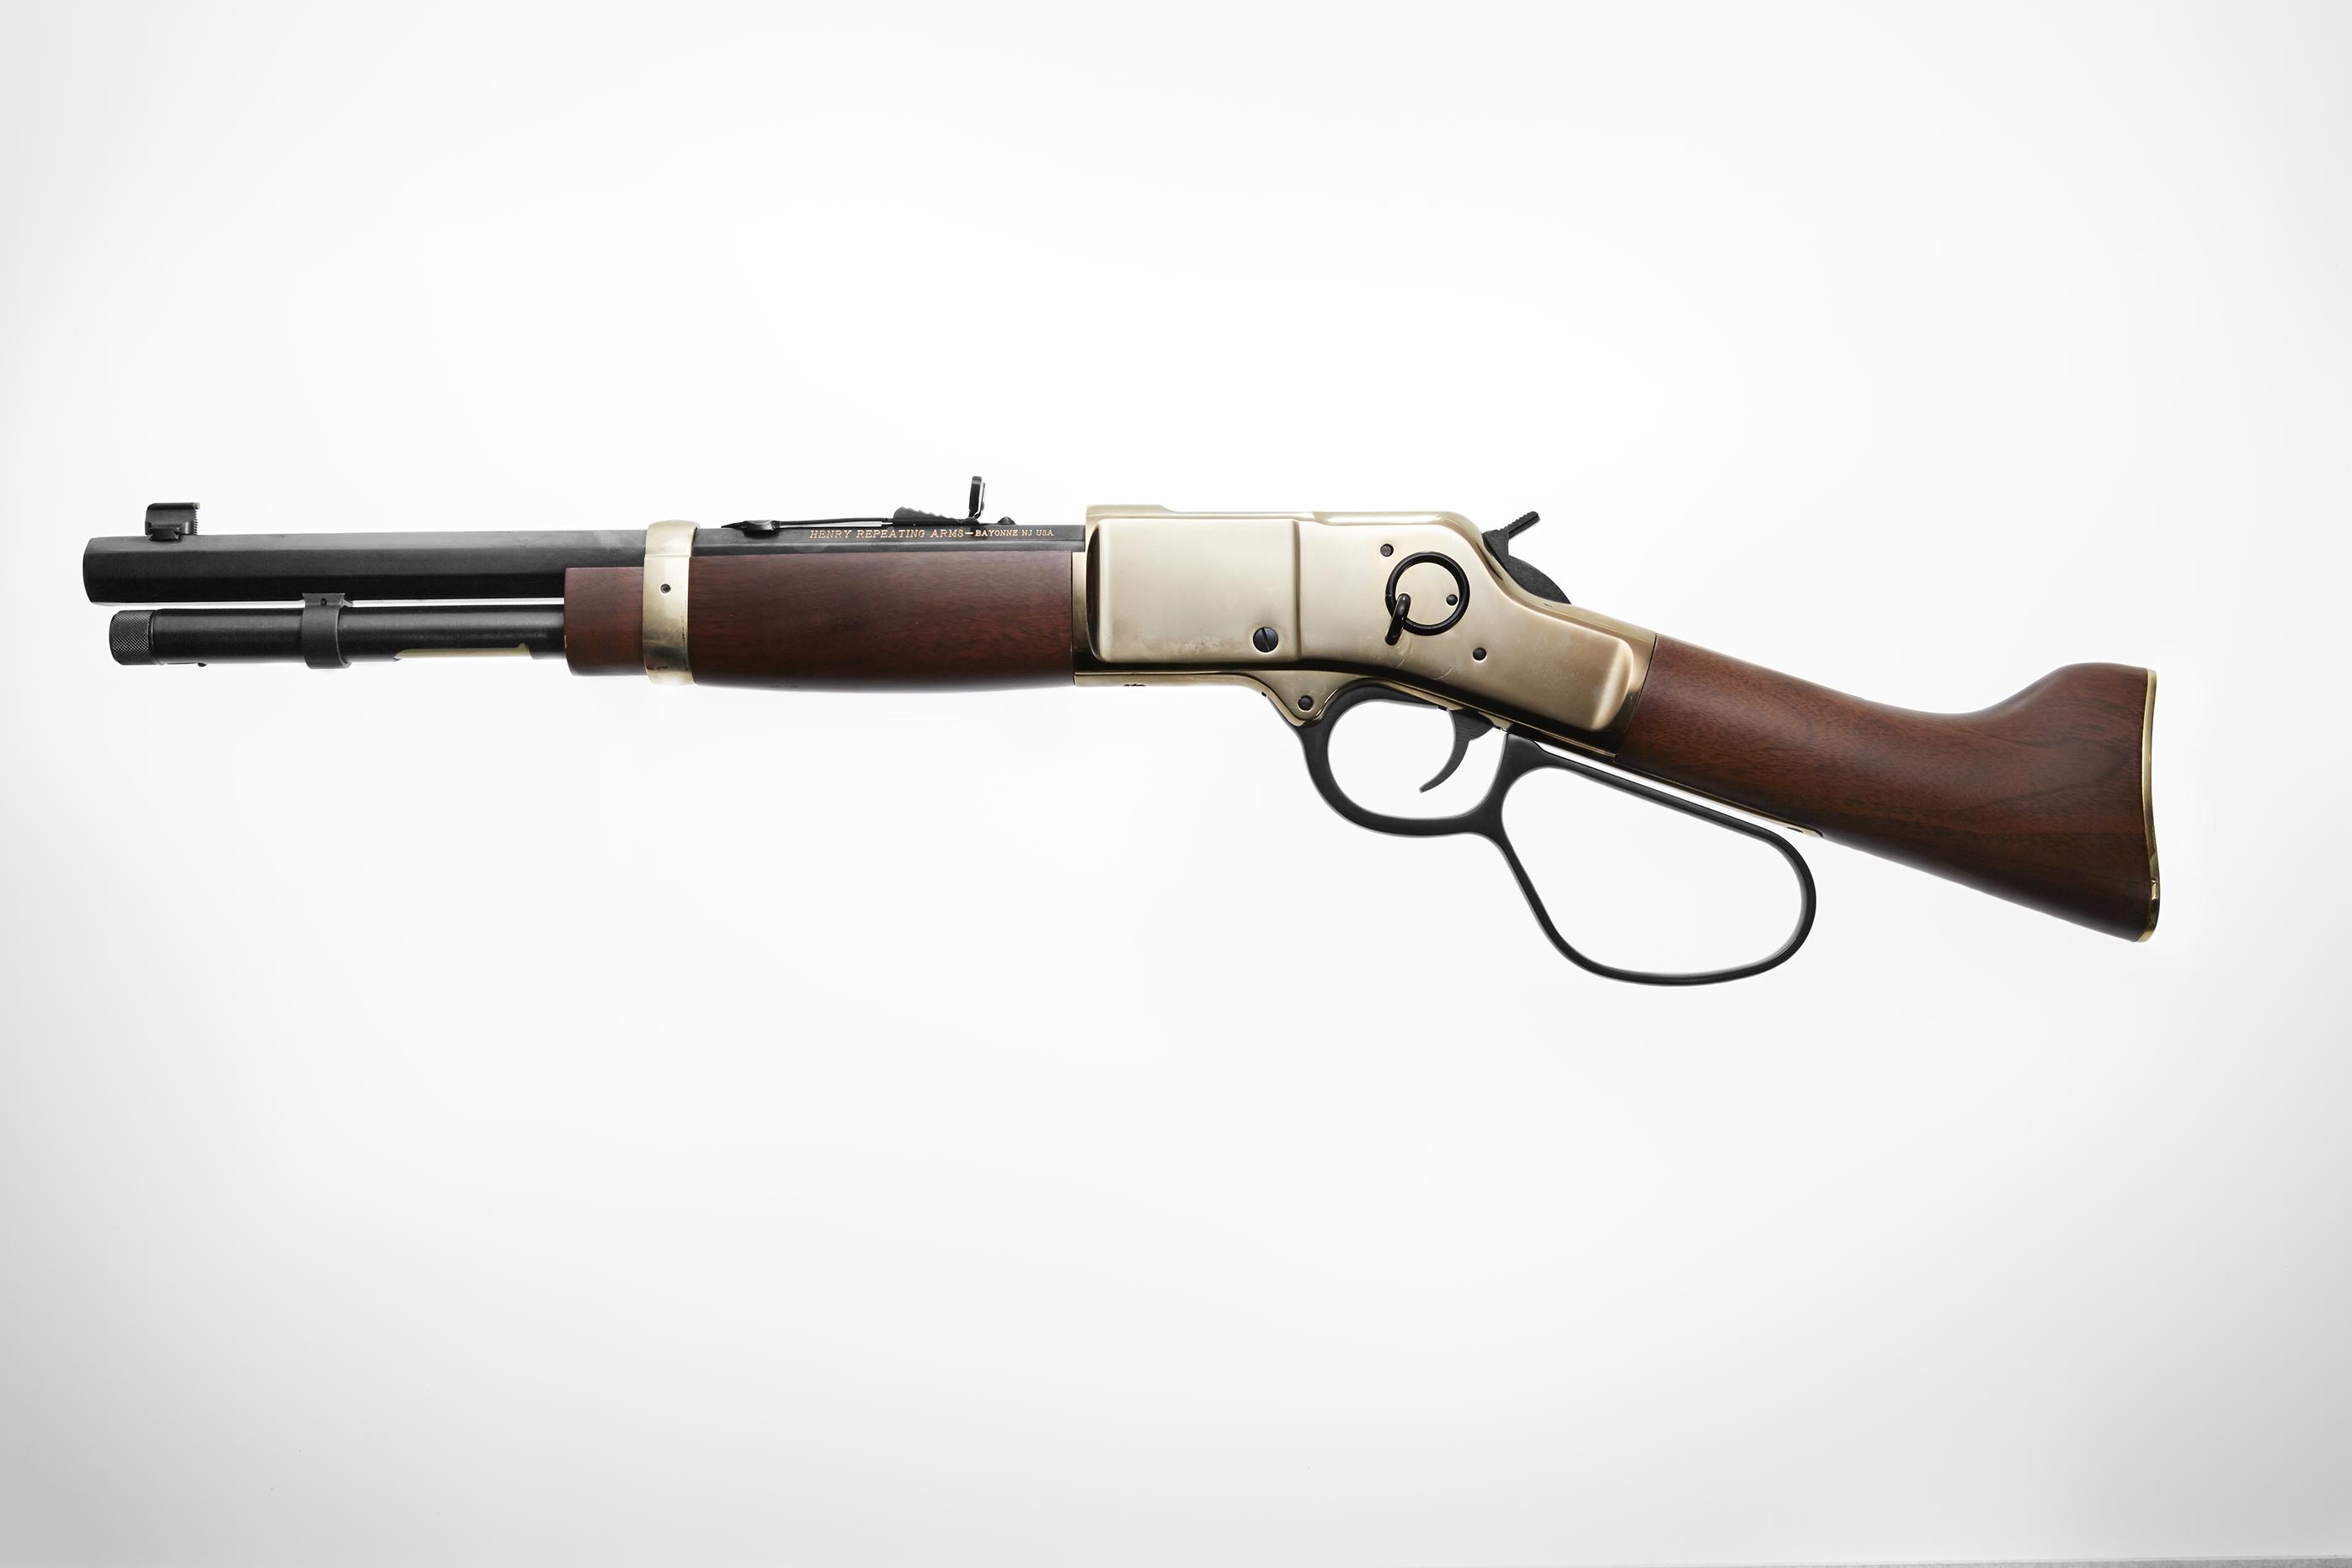 Rifle1 Sharper 50